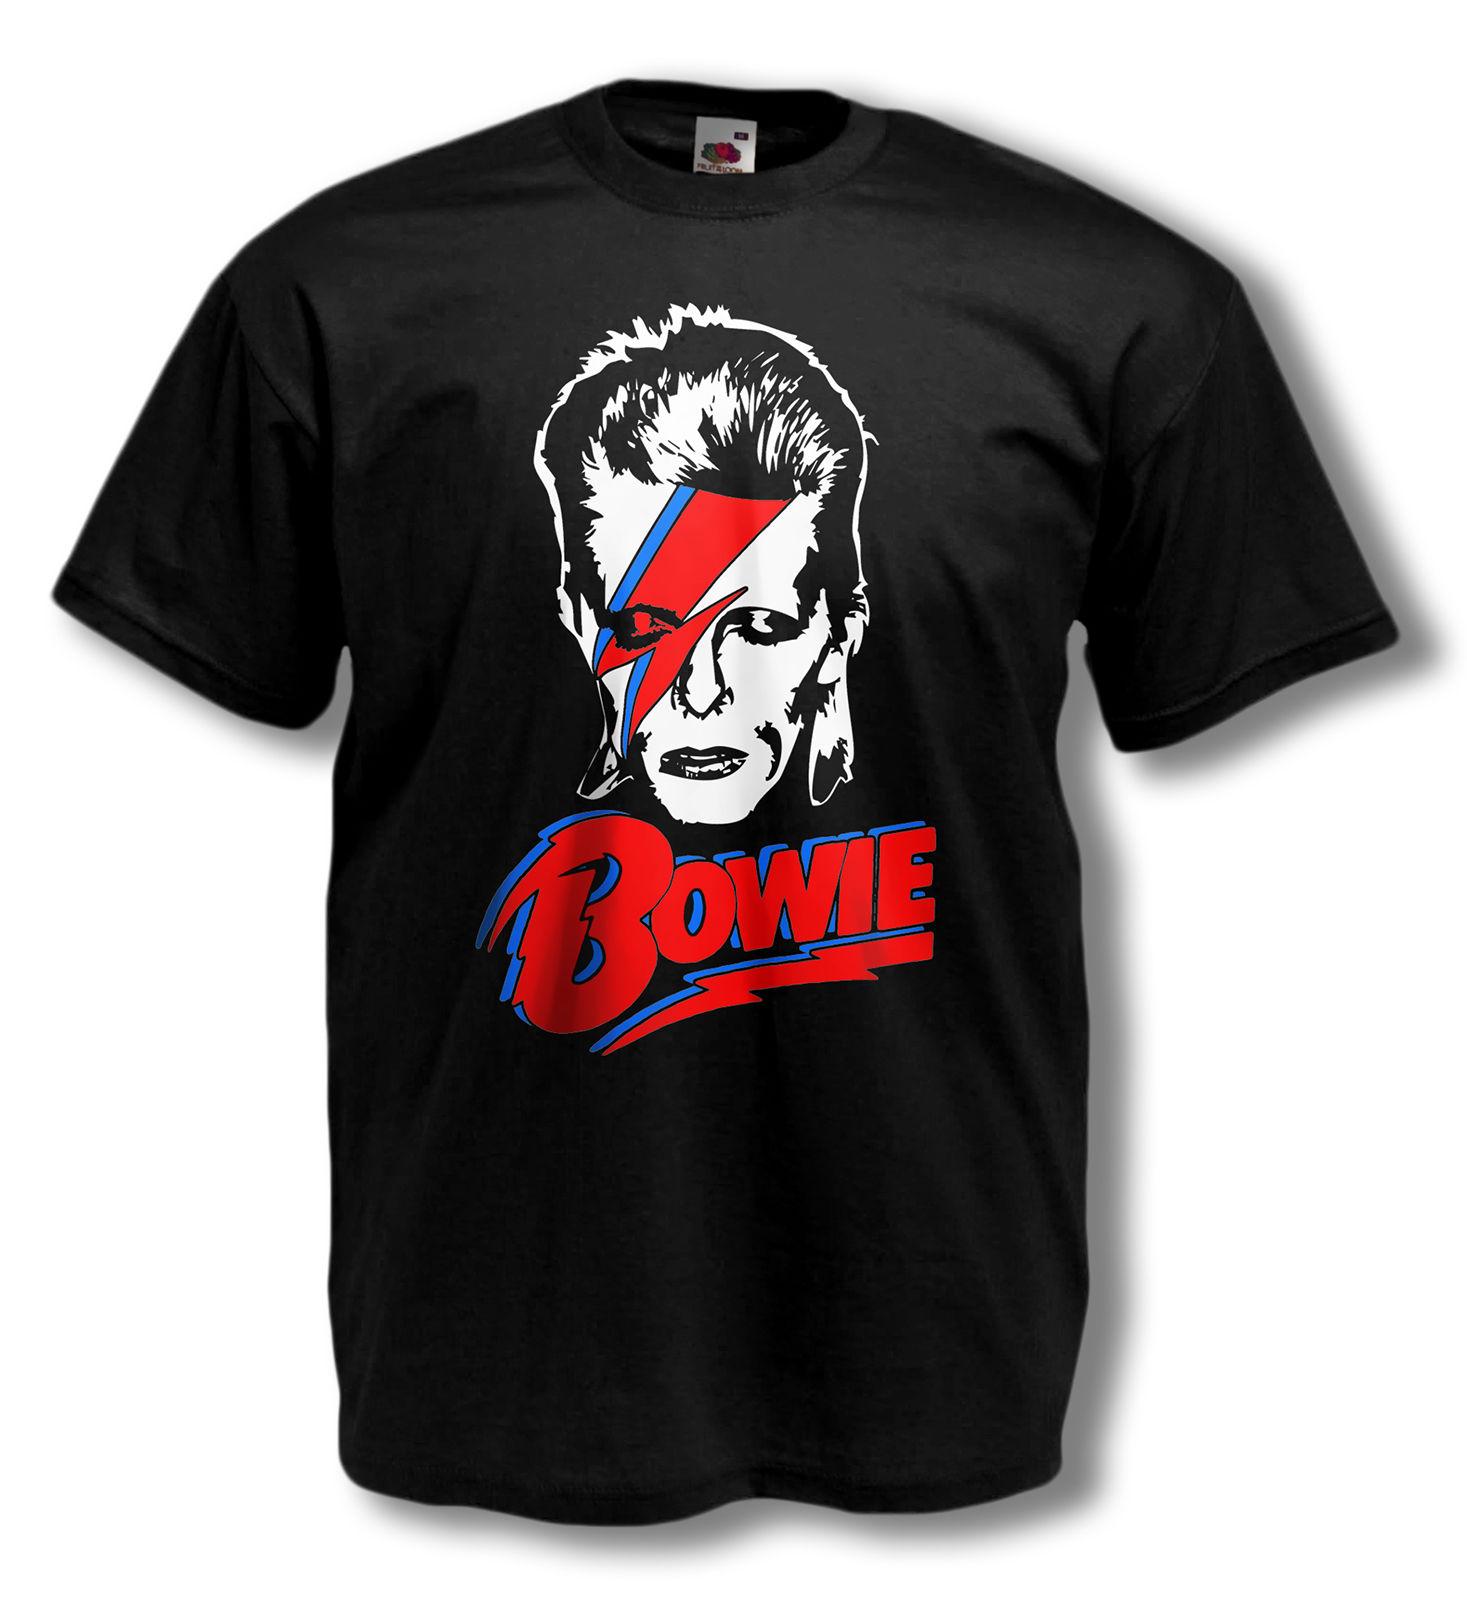 David Bowie T-shirt ALADDIN SANE bowie tribute tshirt JEAN GENIE mens ALL SIZES Men T Shirt 2018 Fashion top tee